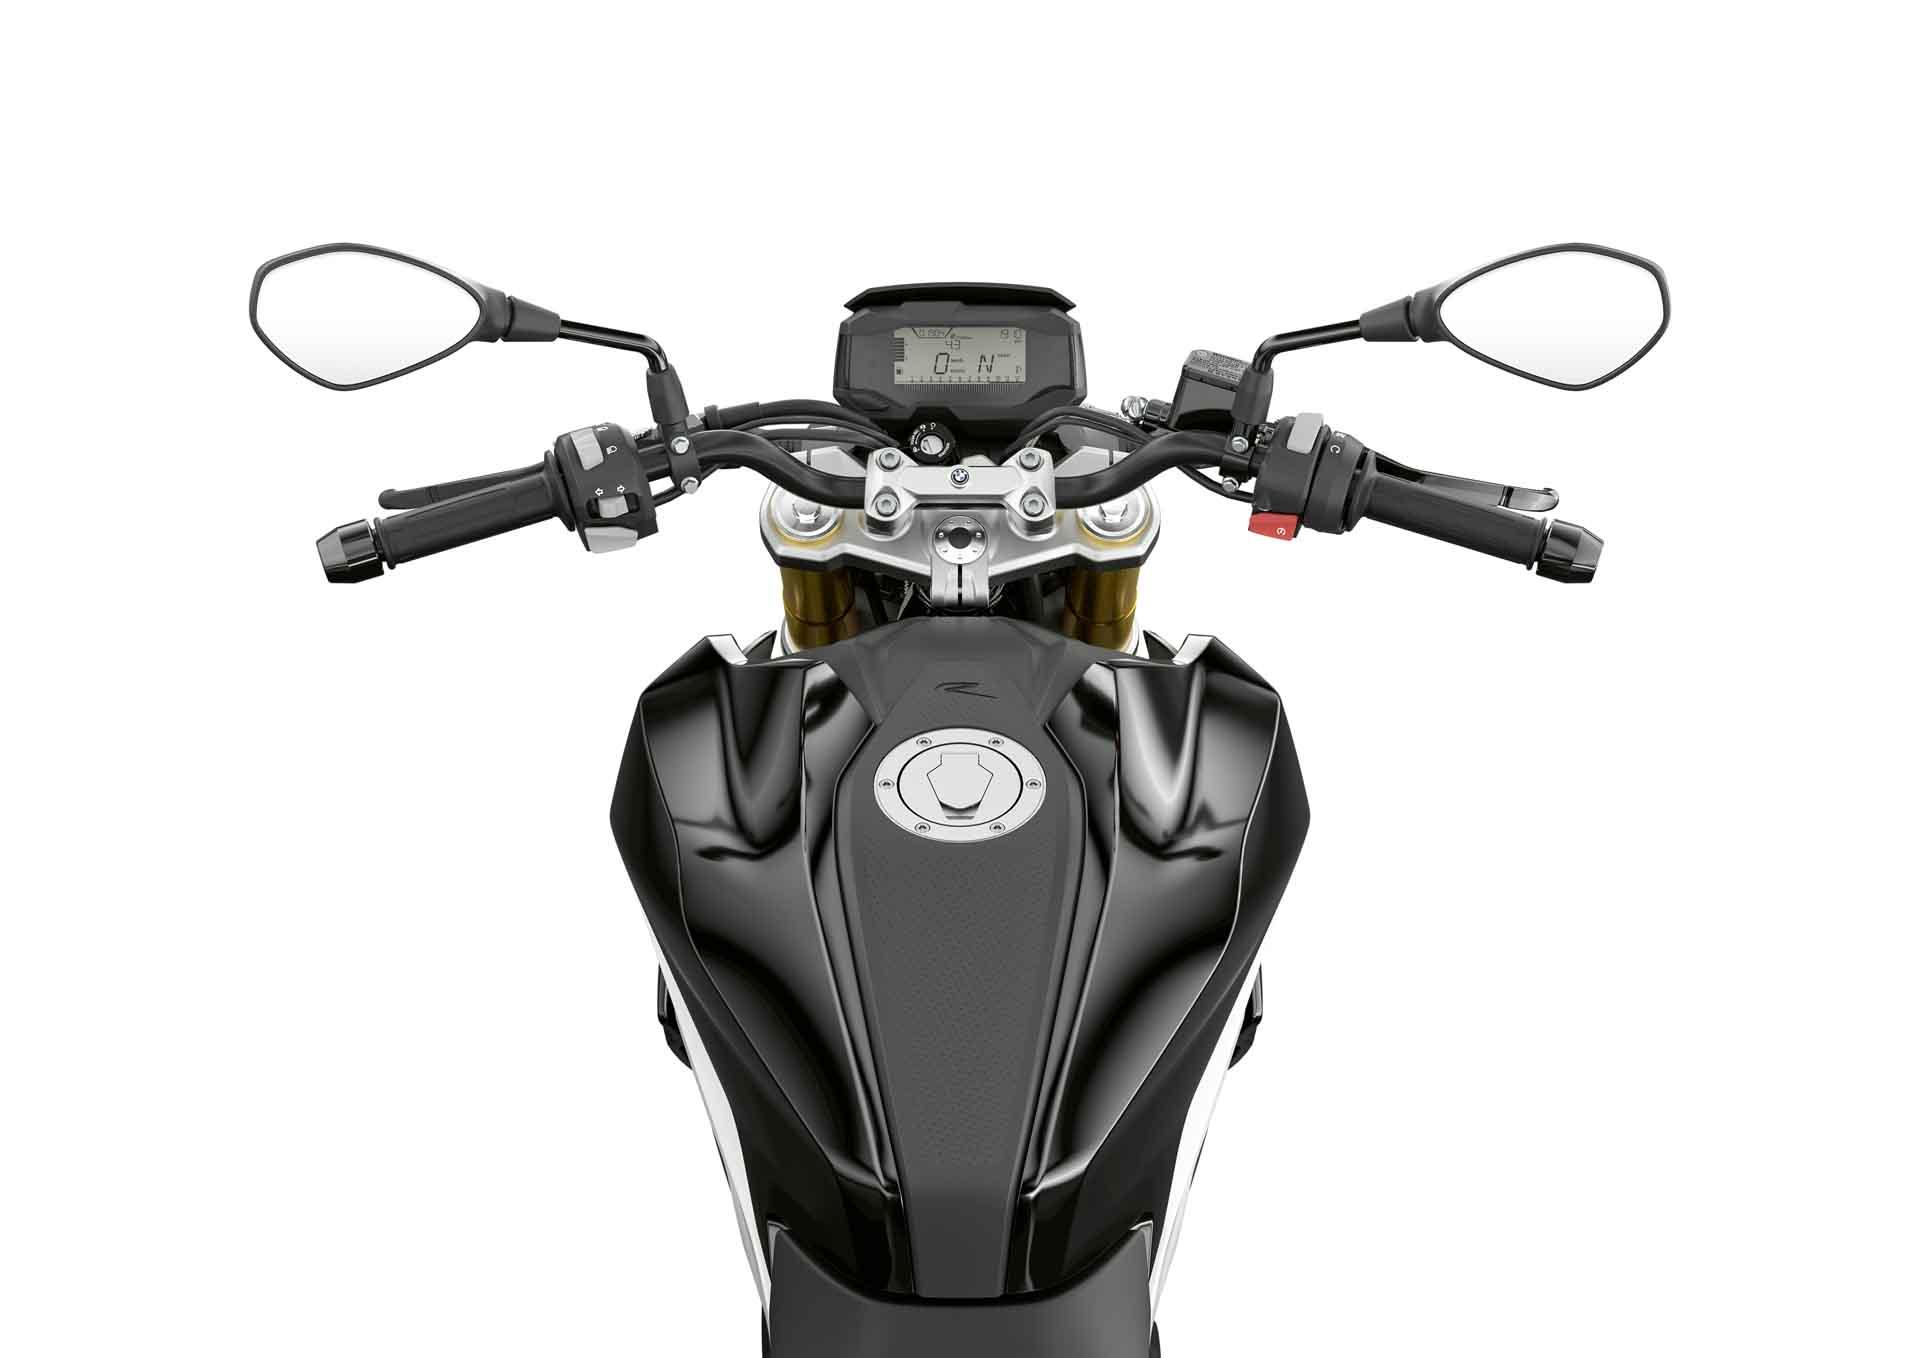 g 310 r black 1